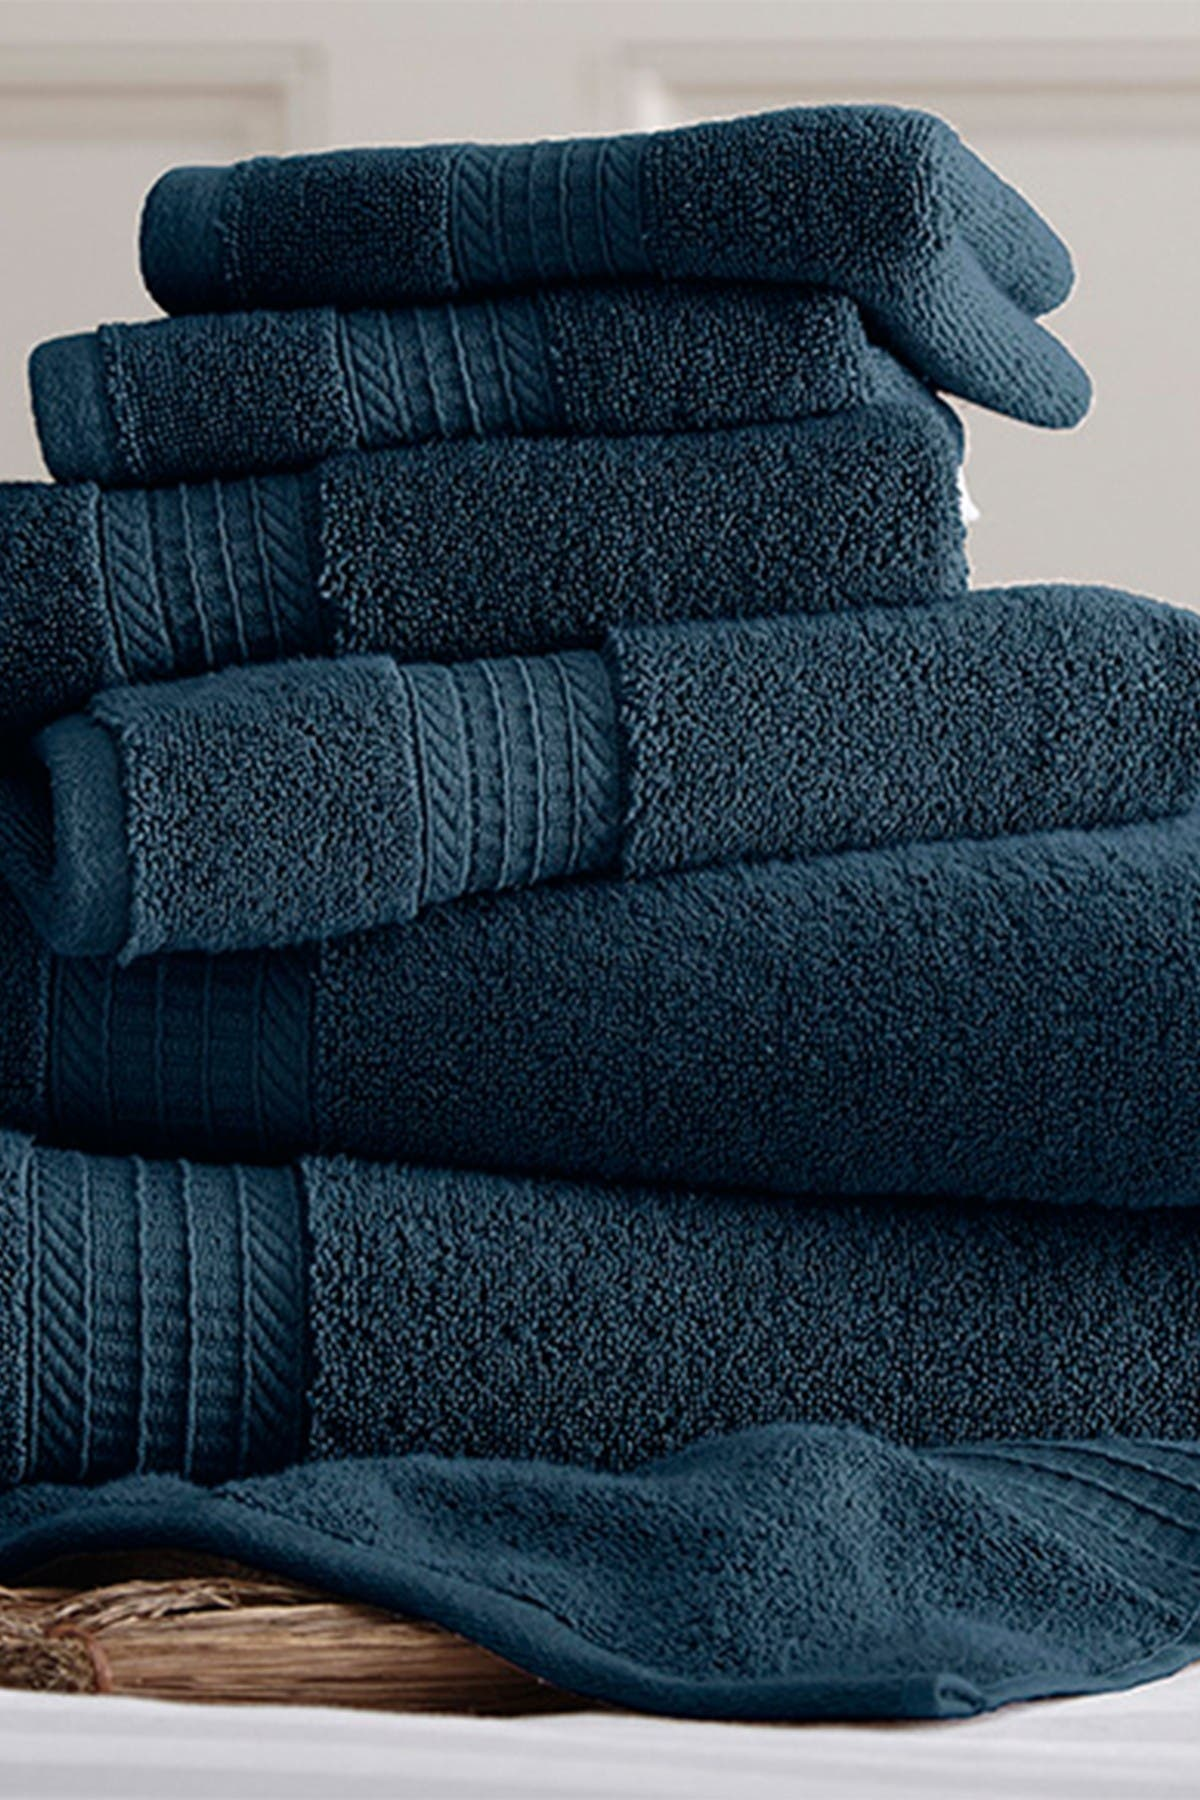 Image of Modern Threads 700 GSM Luxury Spa Collection 6-Piece Towel Set - Denim